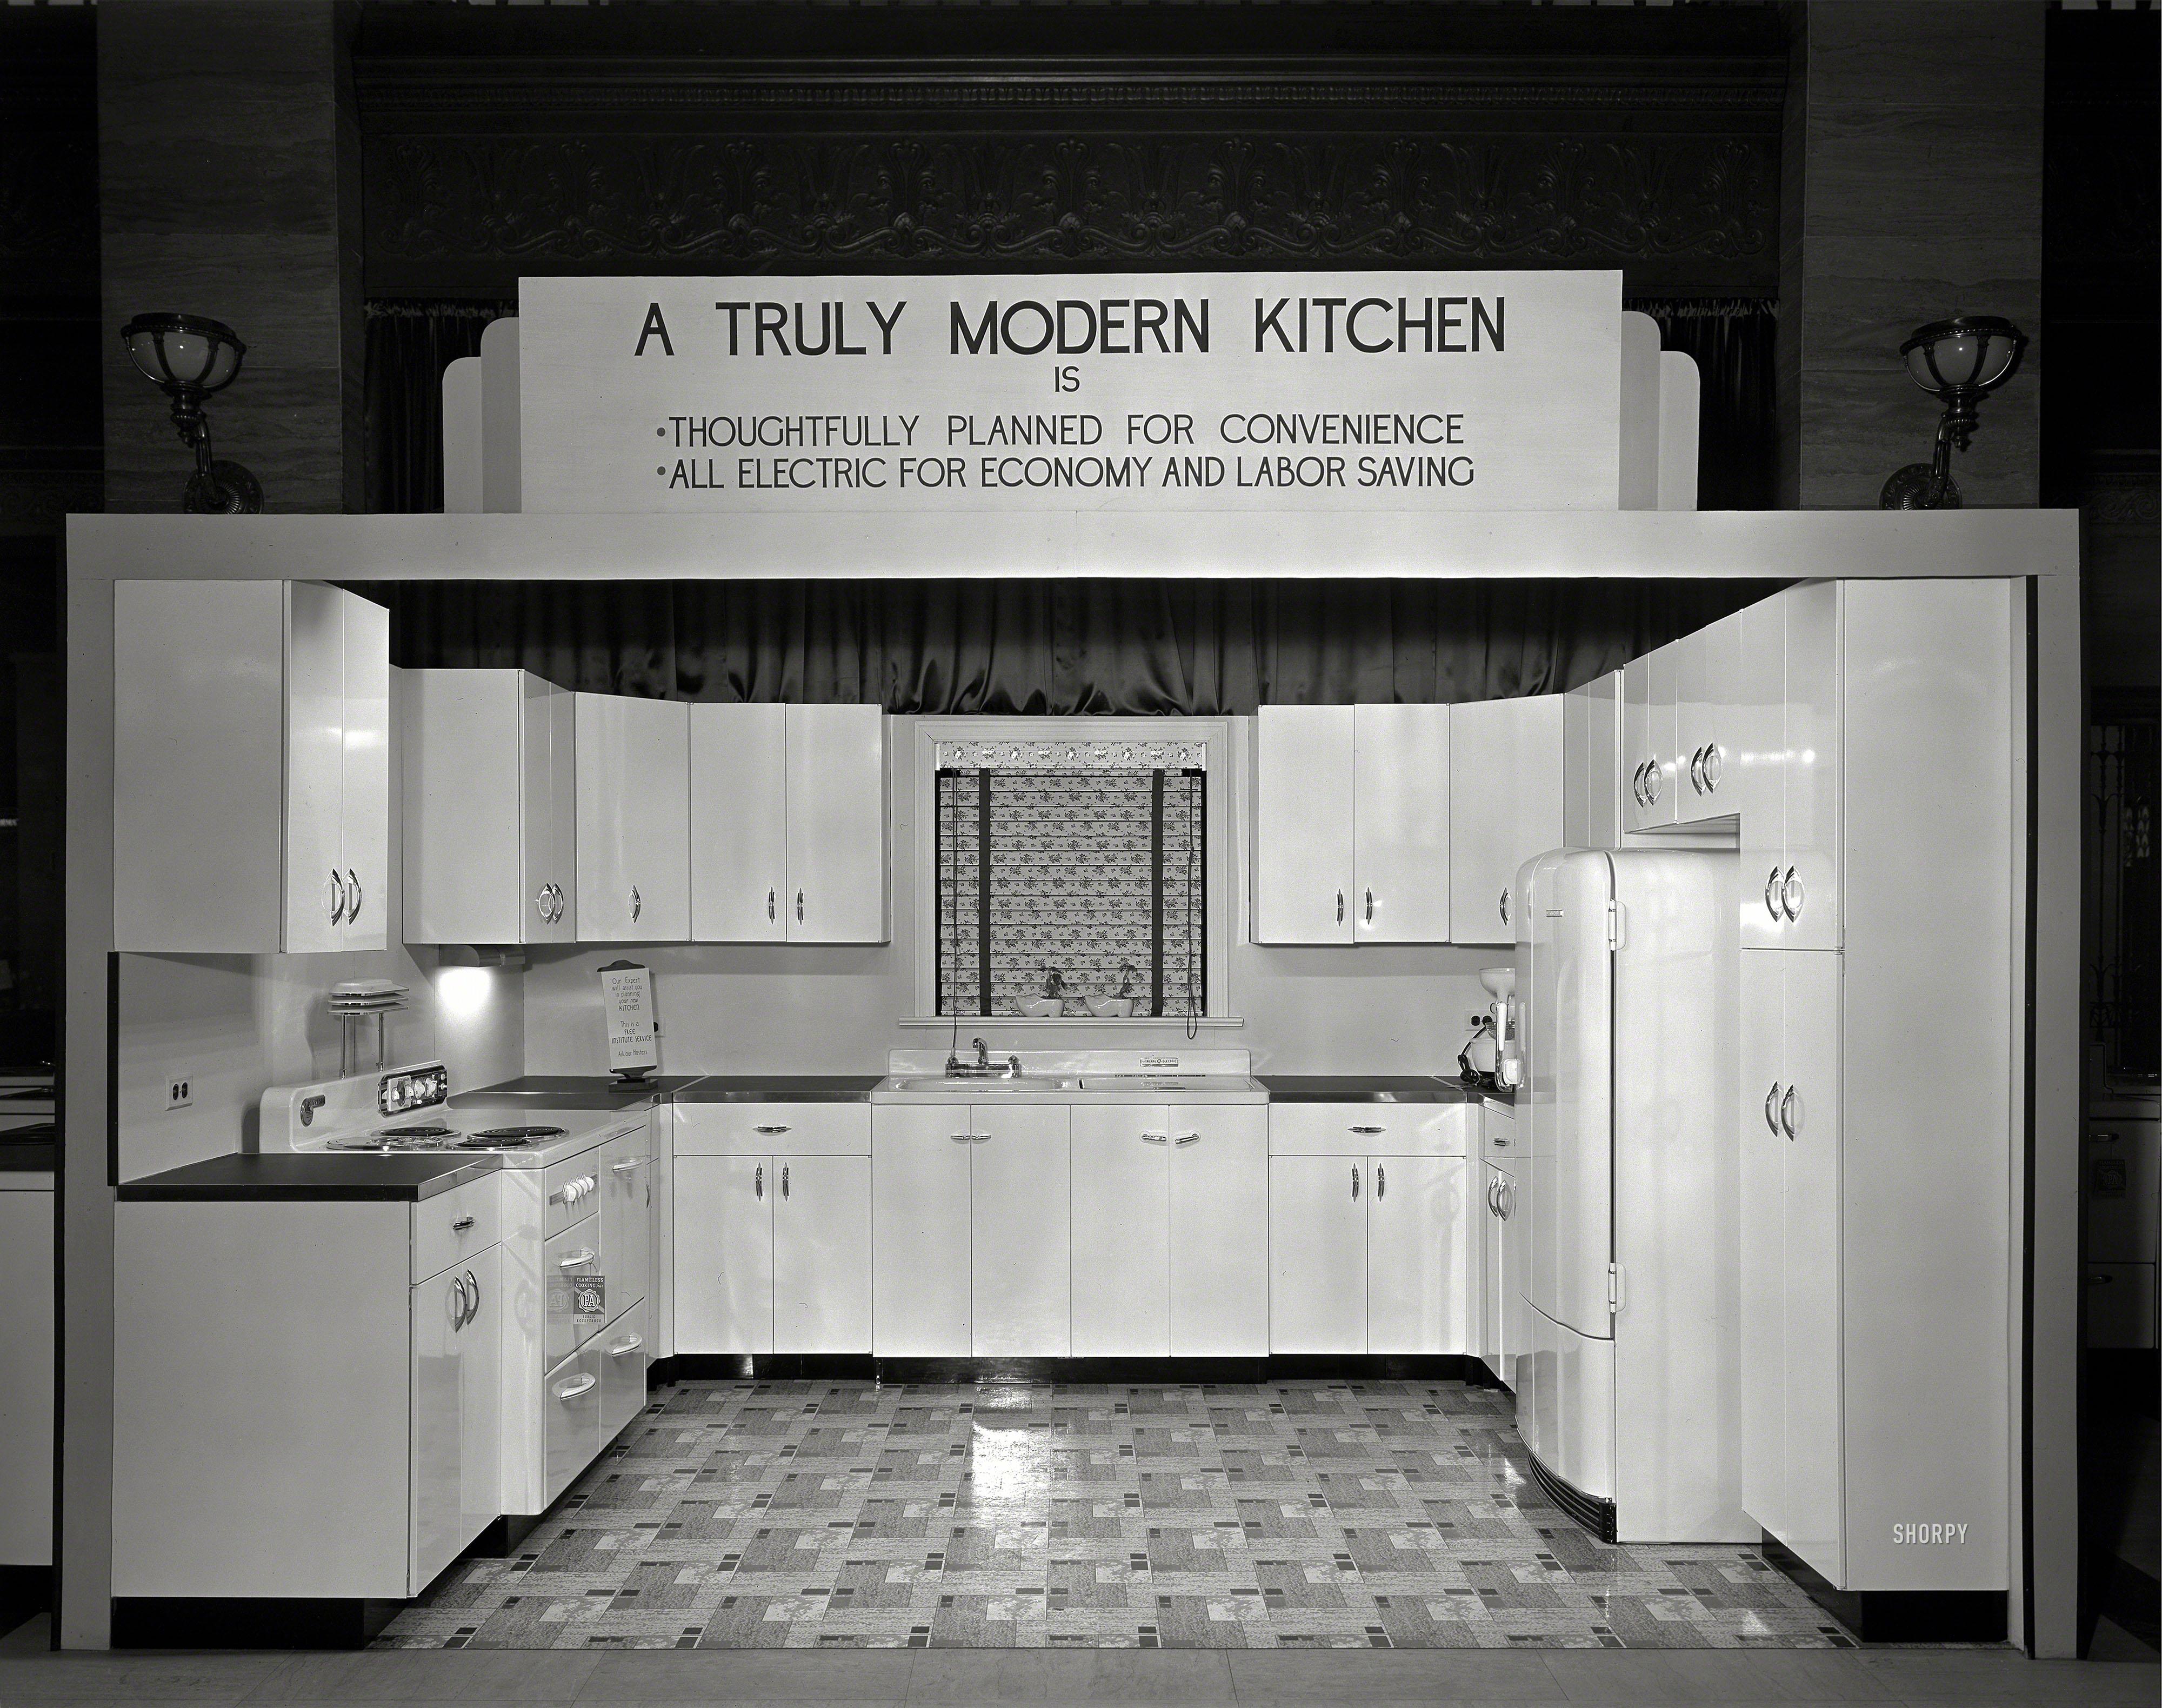 Modern Kitchens Of Syracuse Modern Kitchen 1940 Shorpy 1 Old Photos